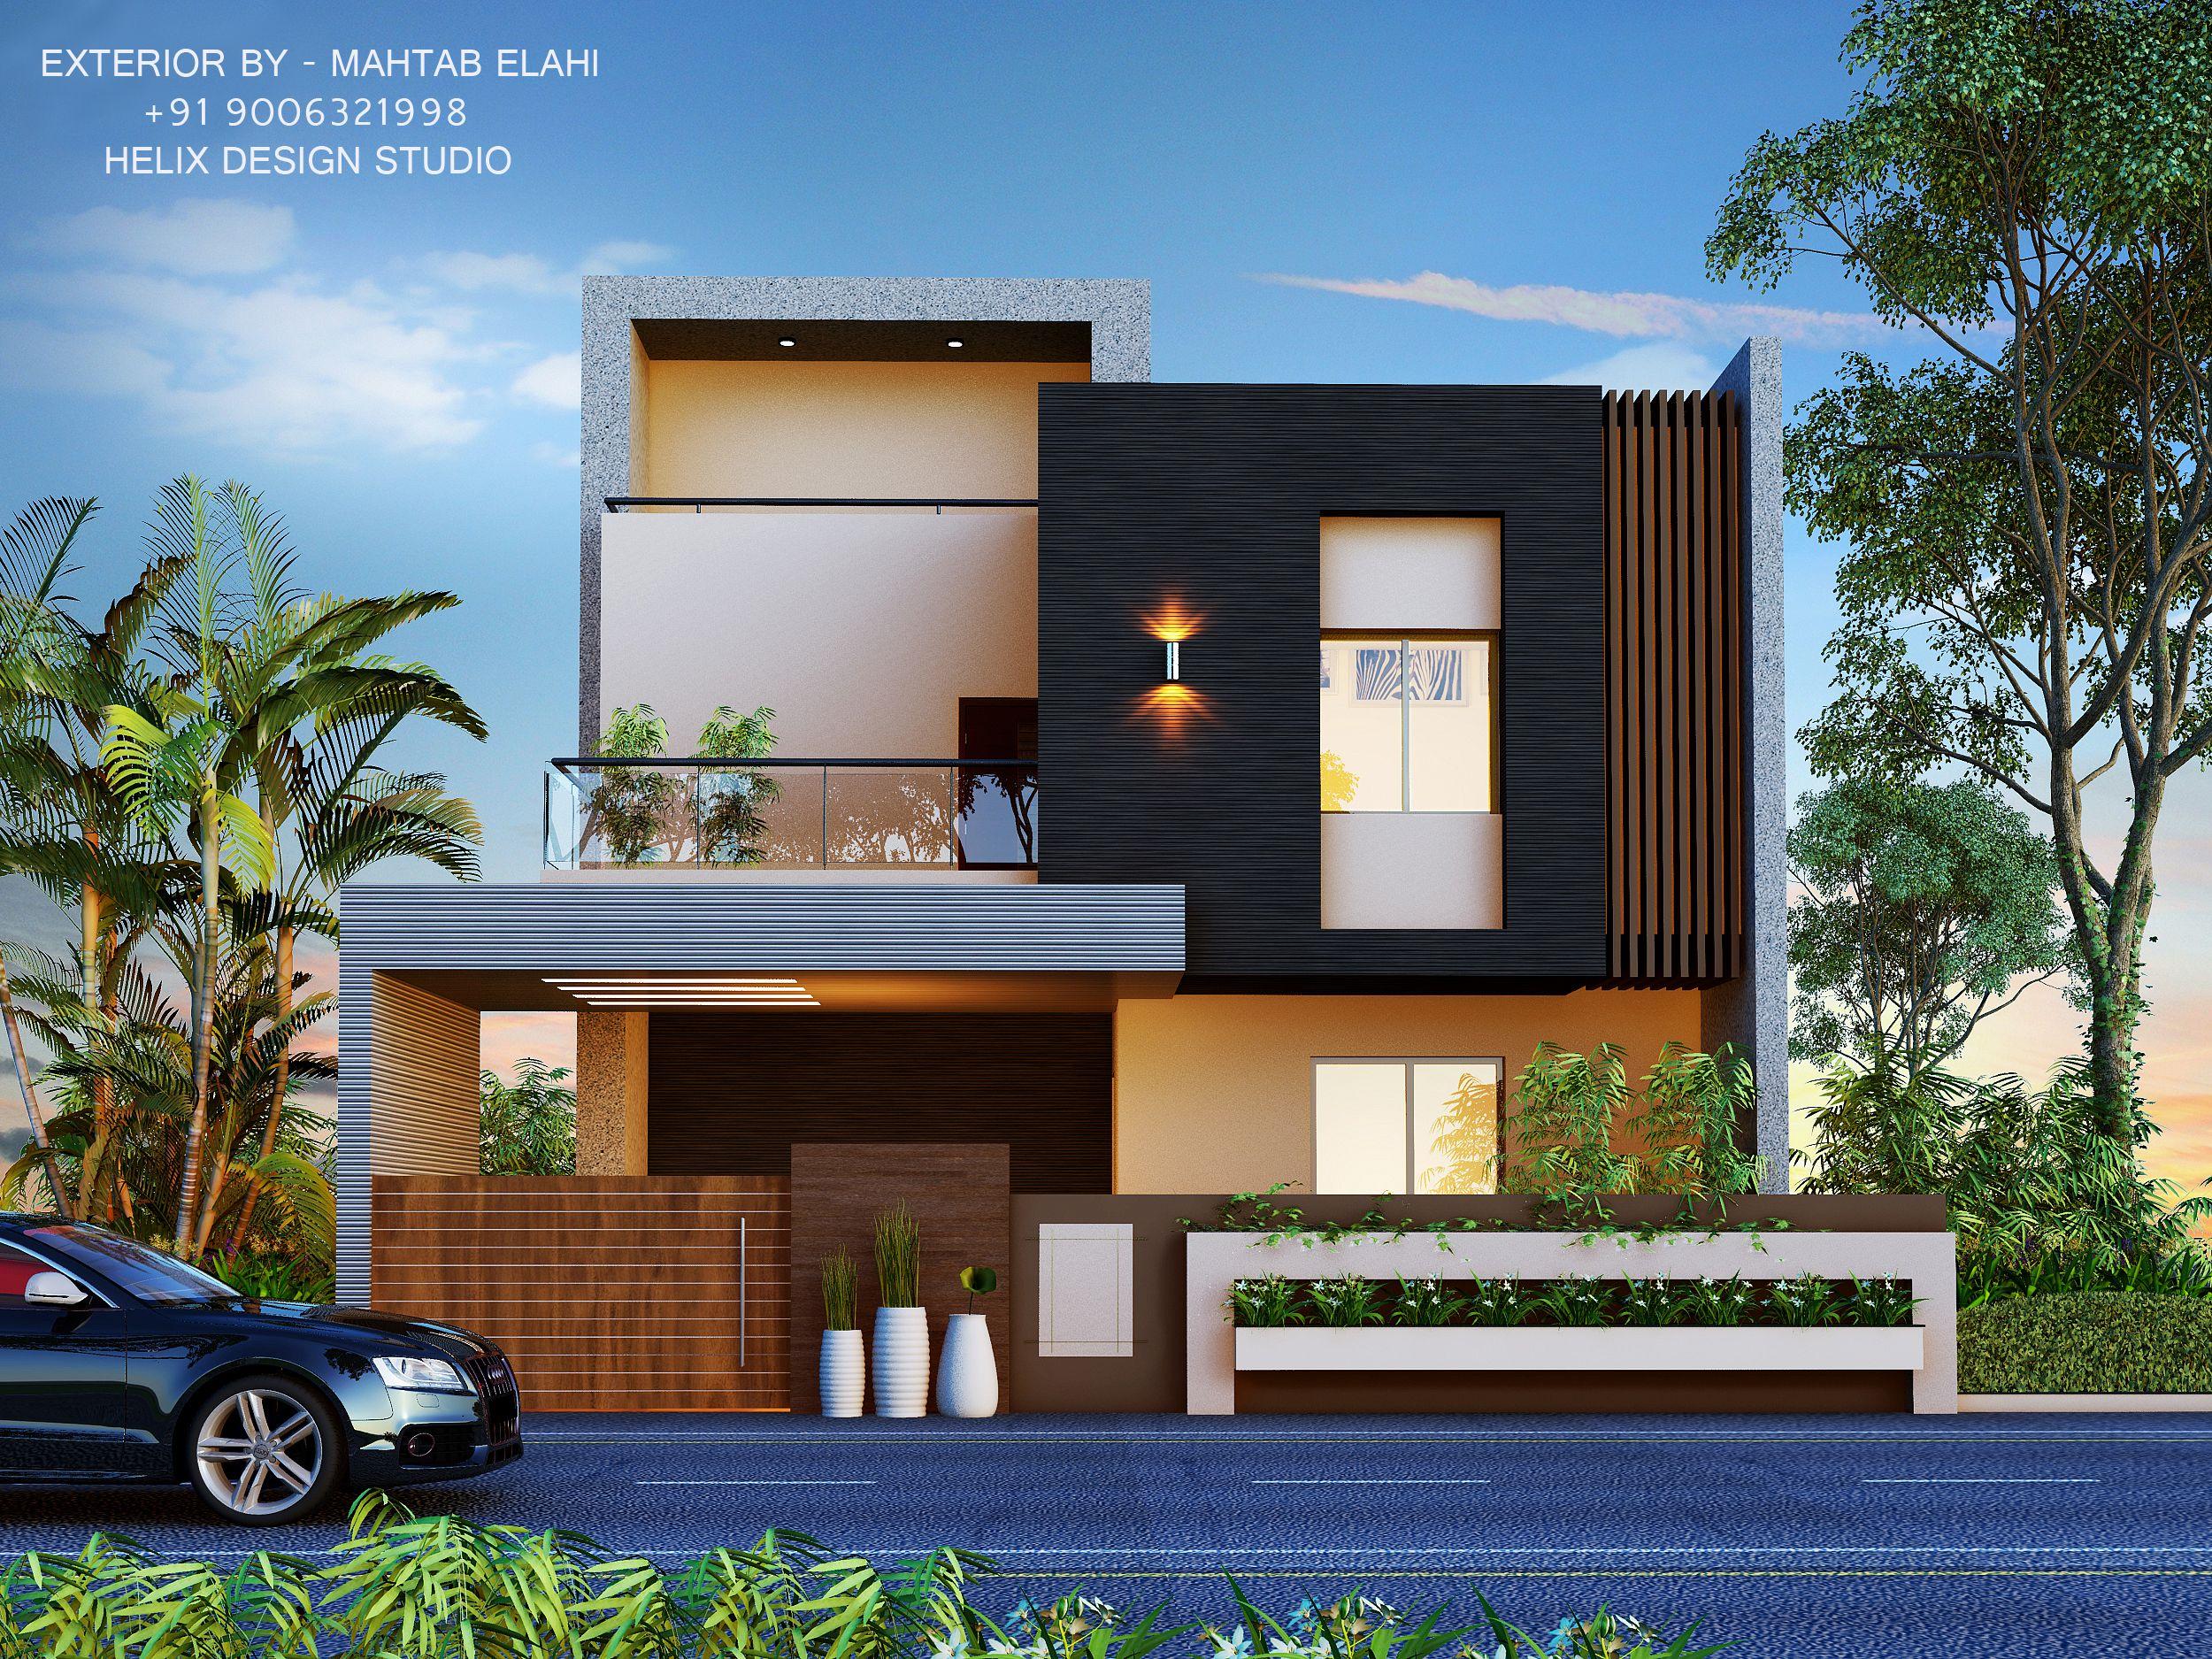 Exterior By Mahtab Elahi 91 9006321998 Helix Design Studio Me